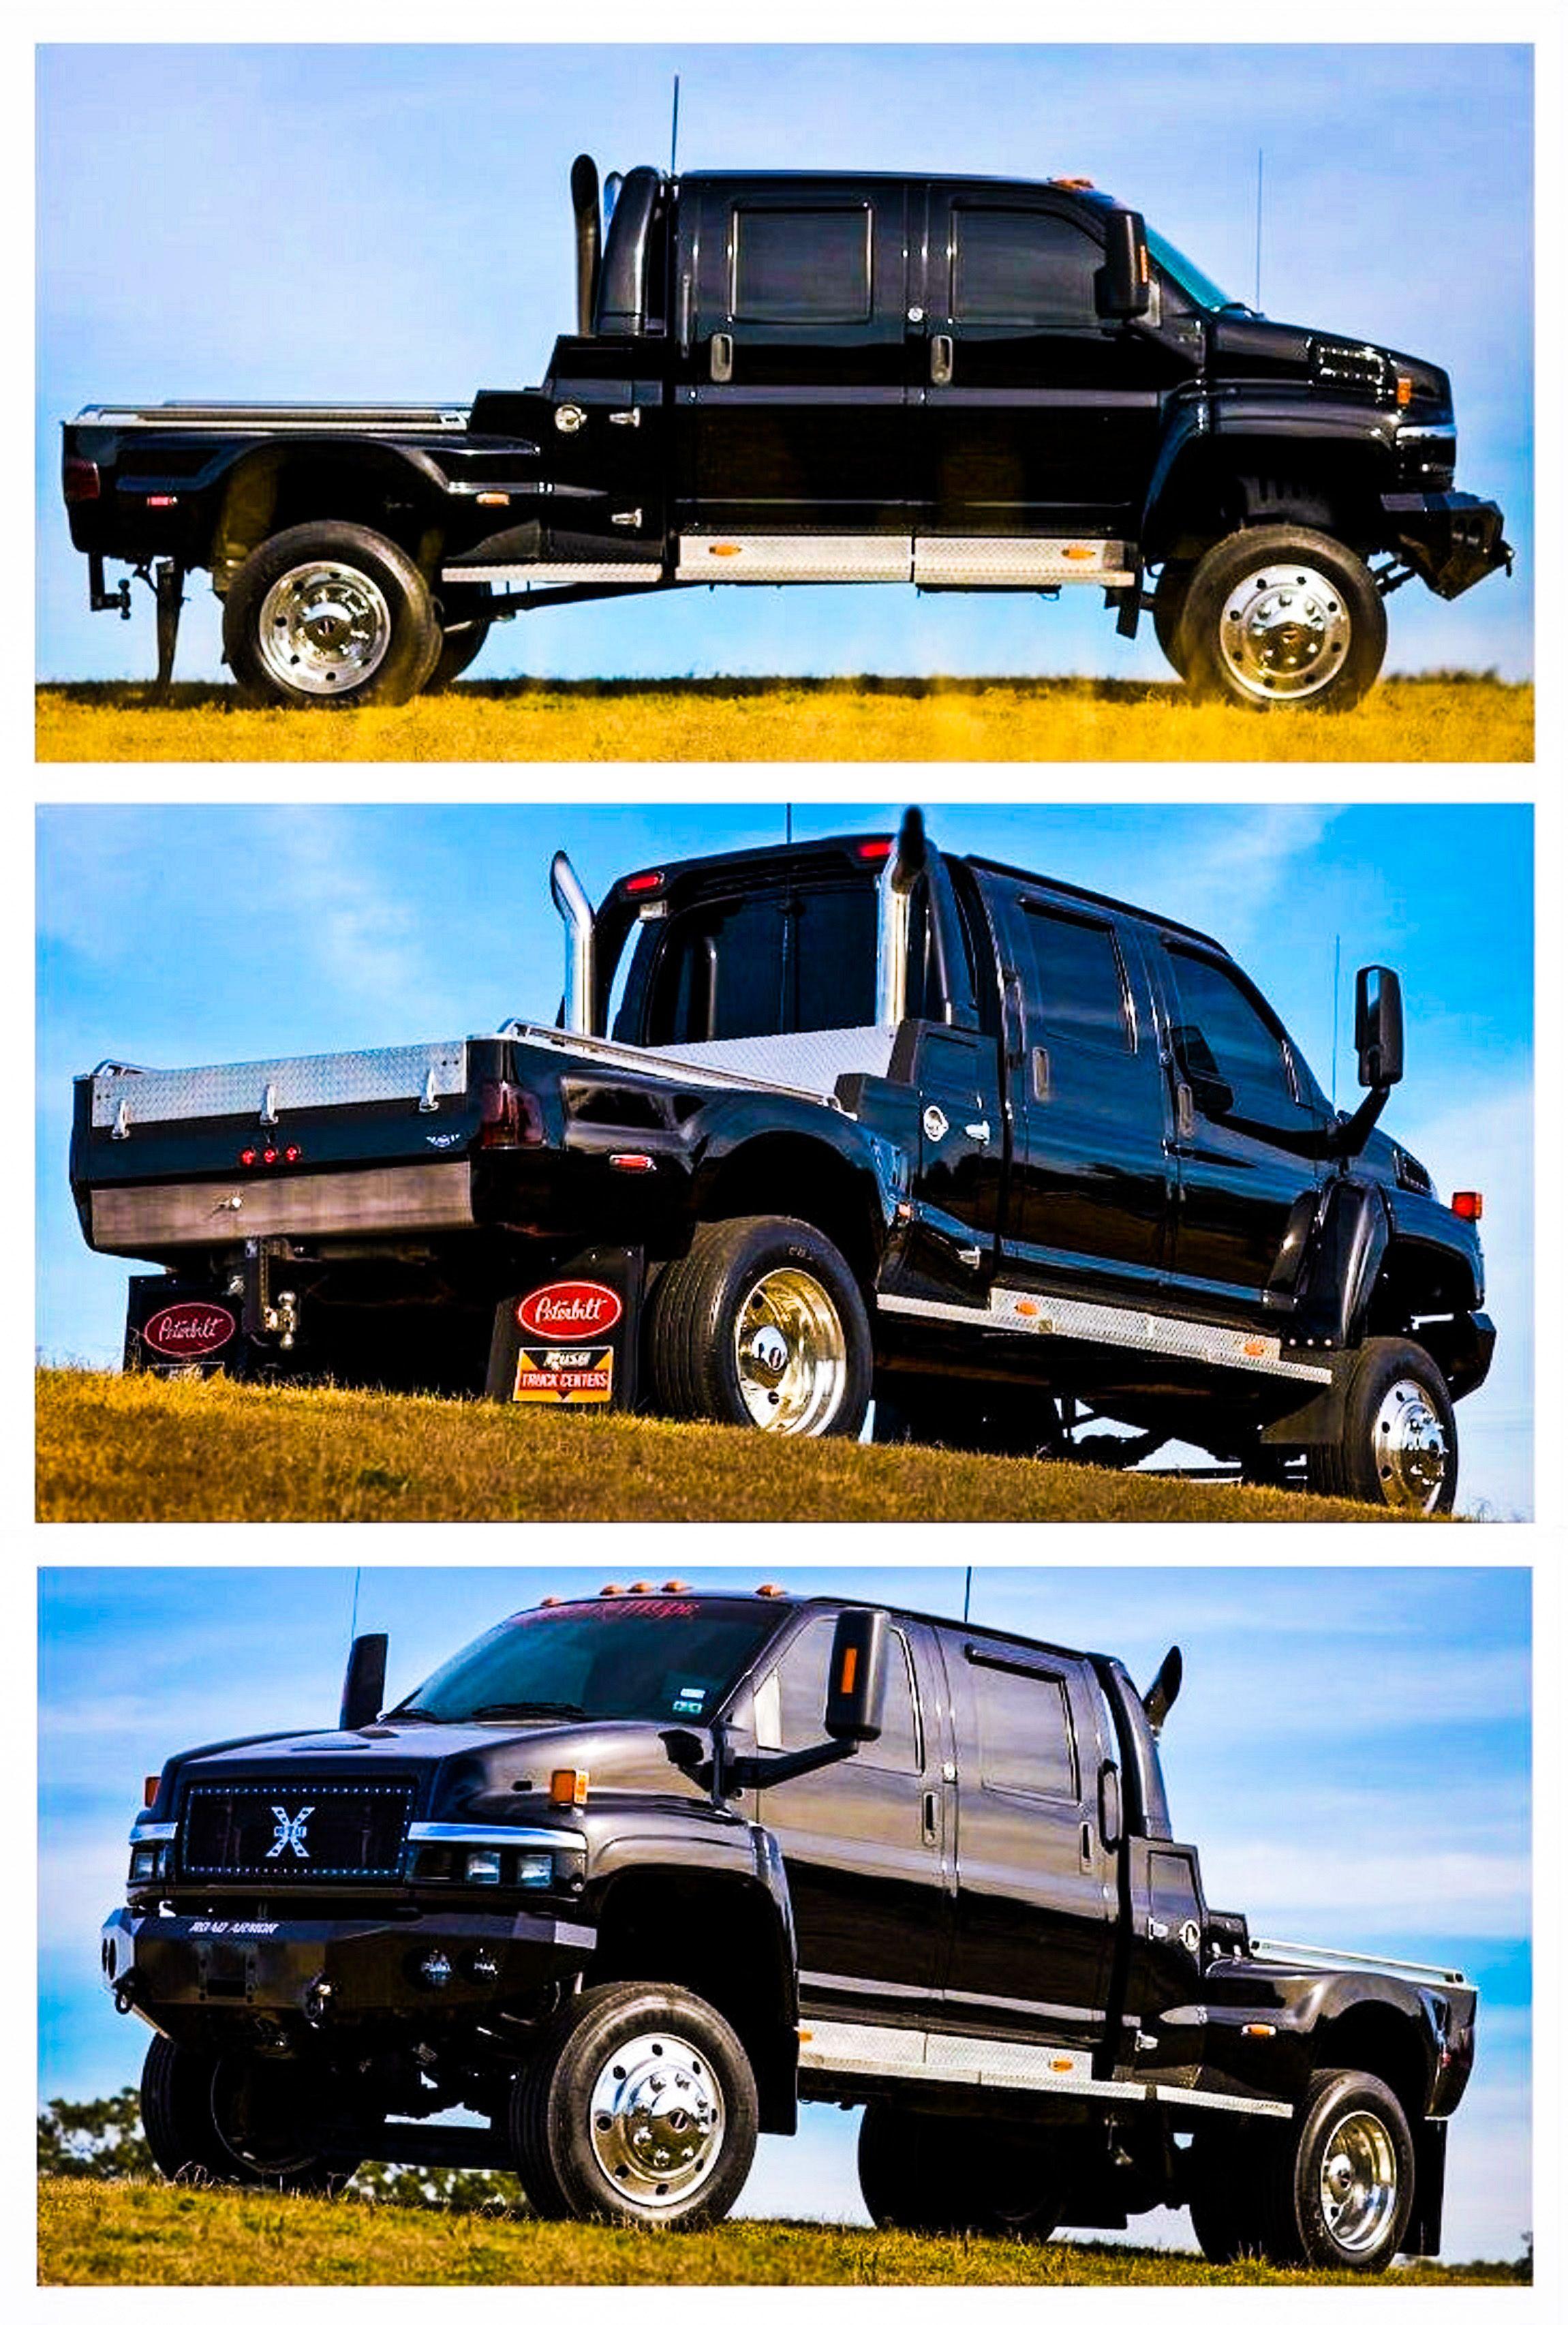 What Kind Of Truck Is Ironhide : truck, ironhide, C4500, Topkick, Extreme, Ironhide, Truck., Http://tenwheel.com/view/14083-2004_gmc_c4500_topkick_extreme_truck_iron…, Trucks,, Chevrolet, Trucks